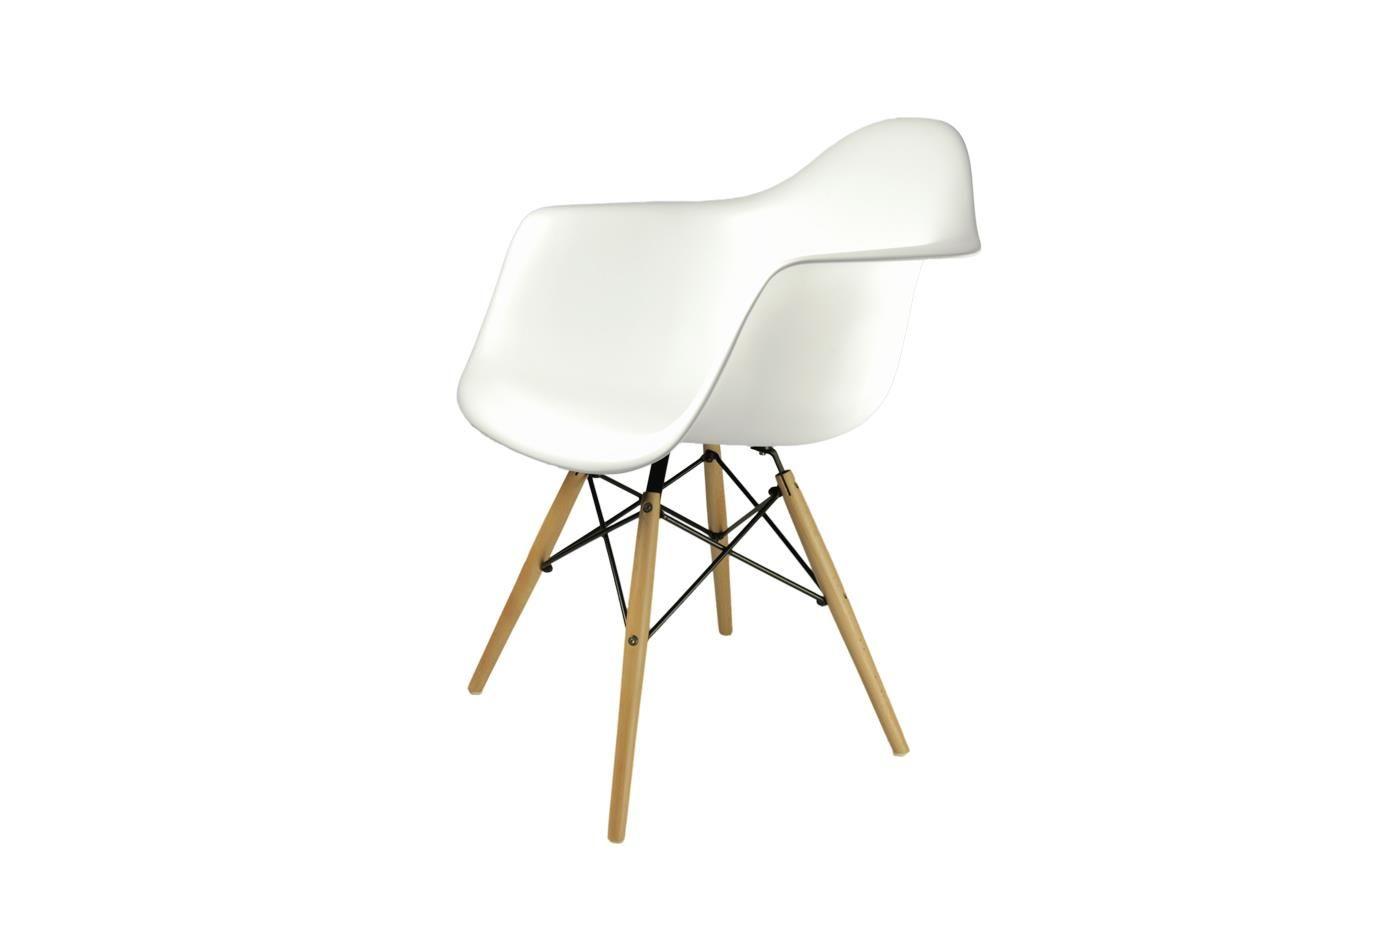 Eames DAW wit design stoel met houten onderstel. <strong><span style ...